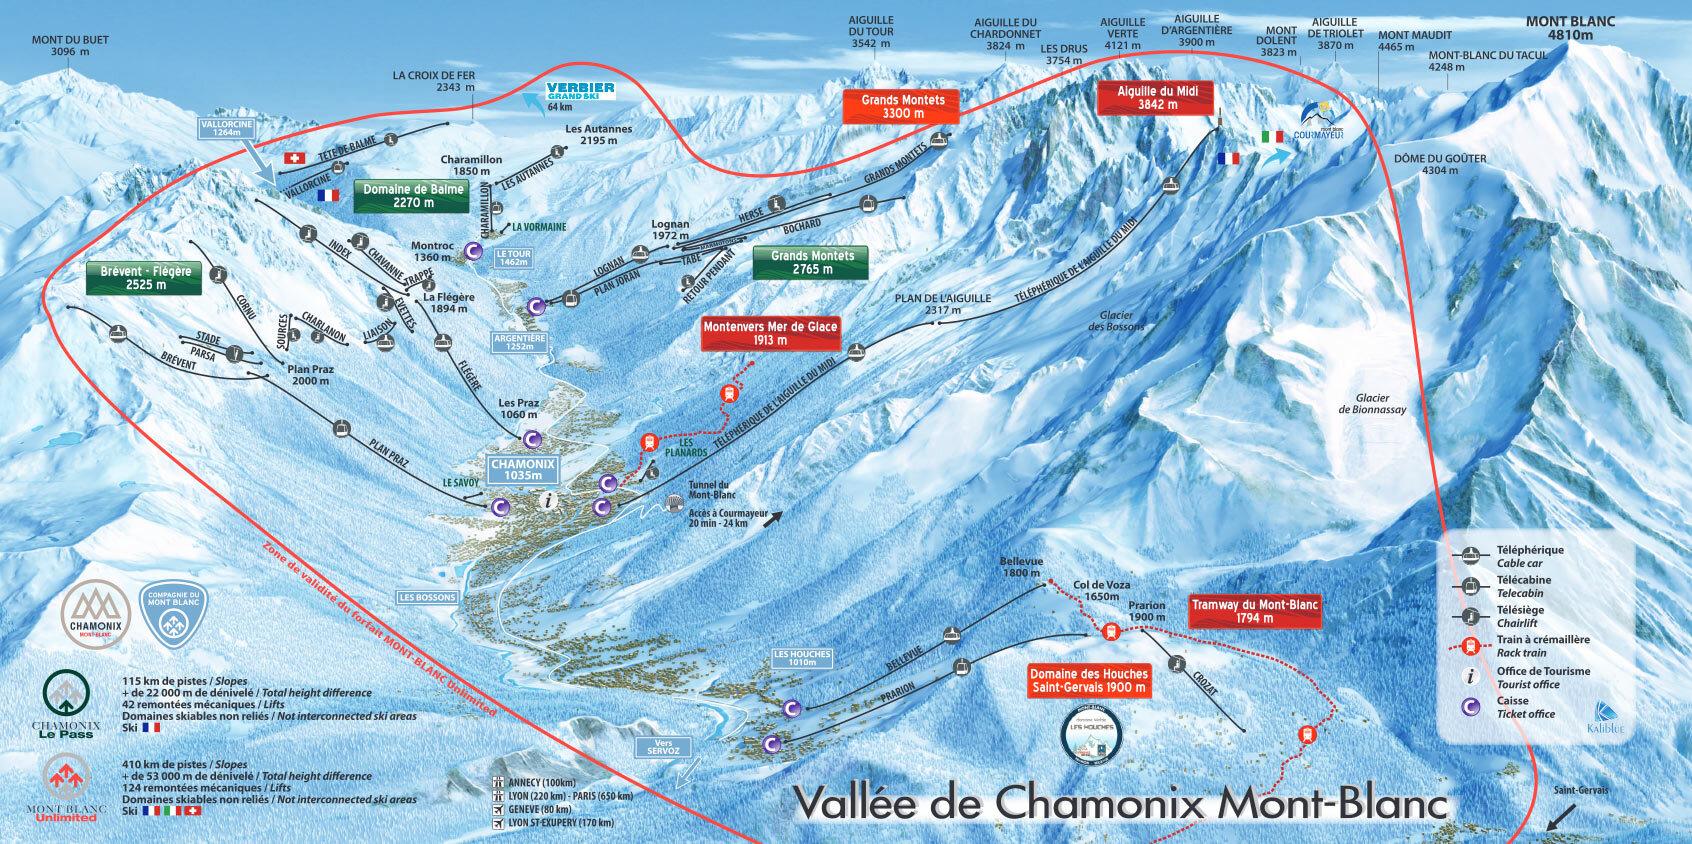 Chamonix Piste Map Trail Map